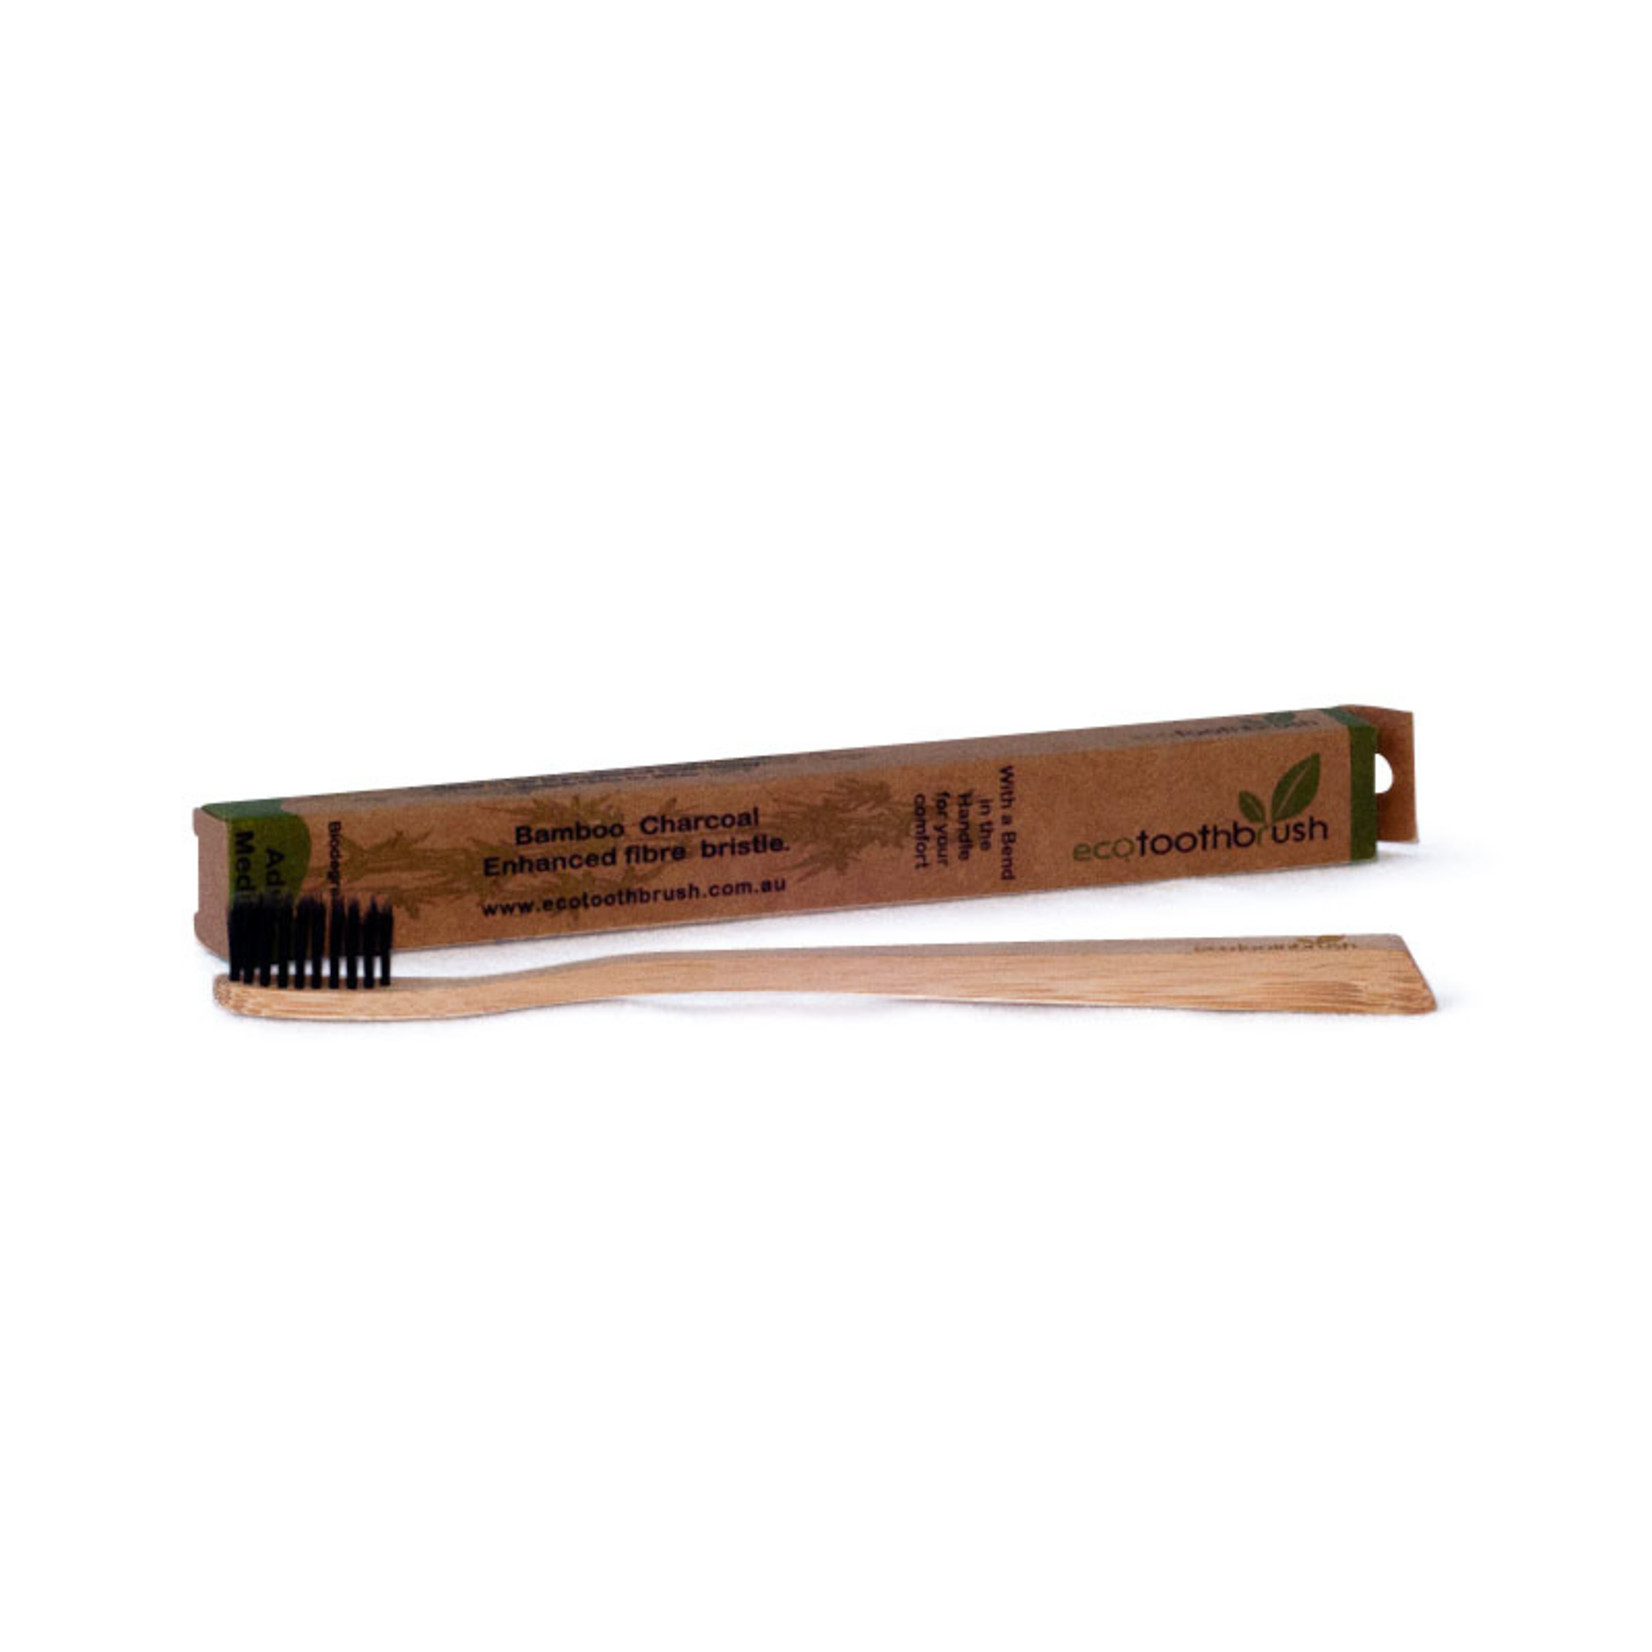 Eco Toothbrush Eco Toothbrush Bamboo Charcoal Toothbrush